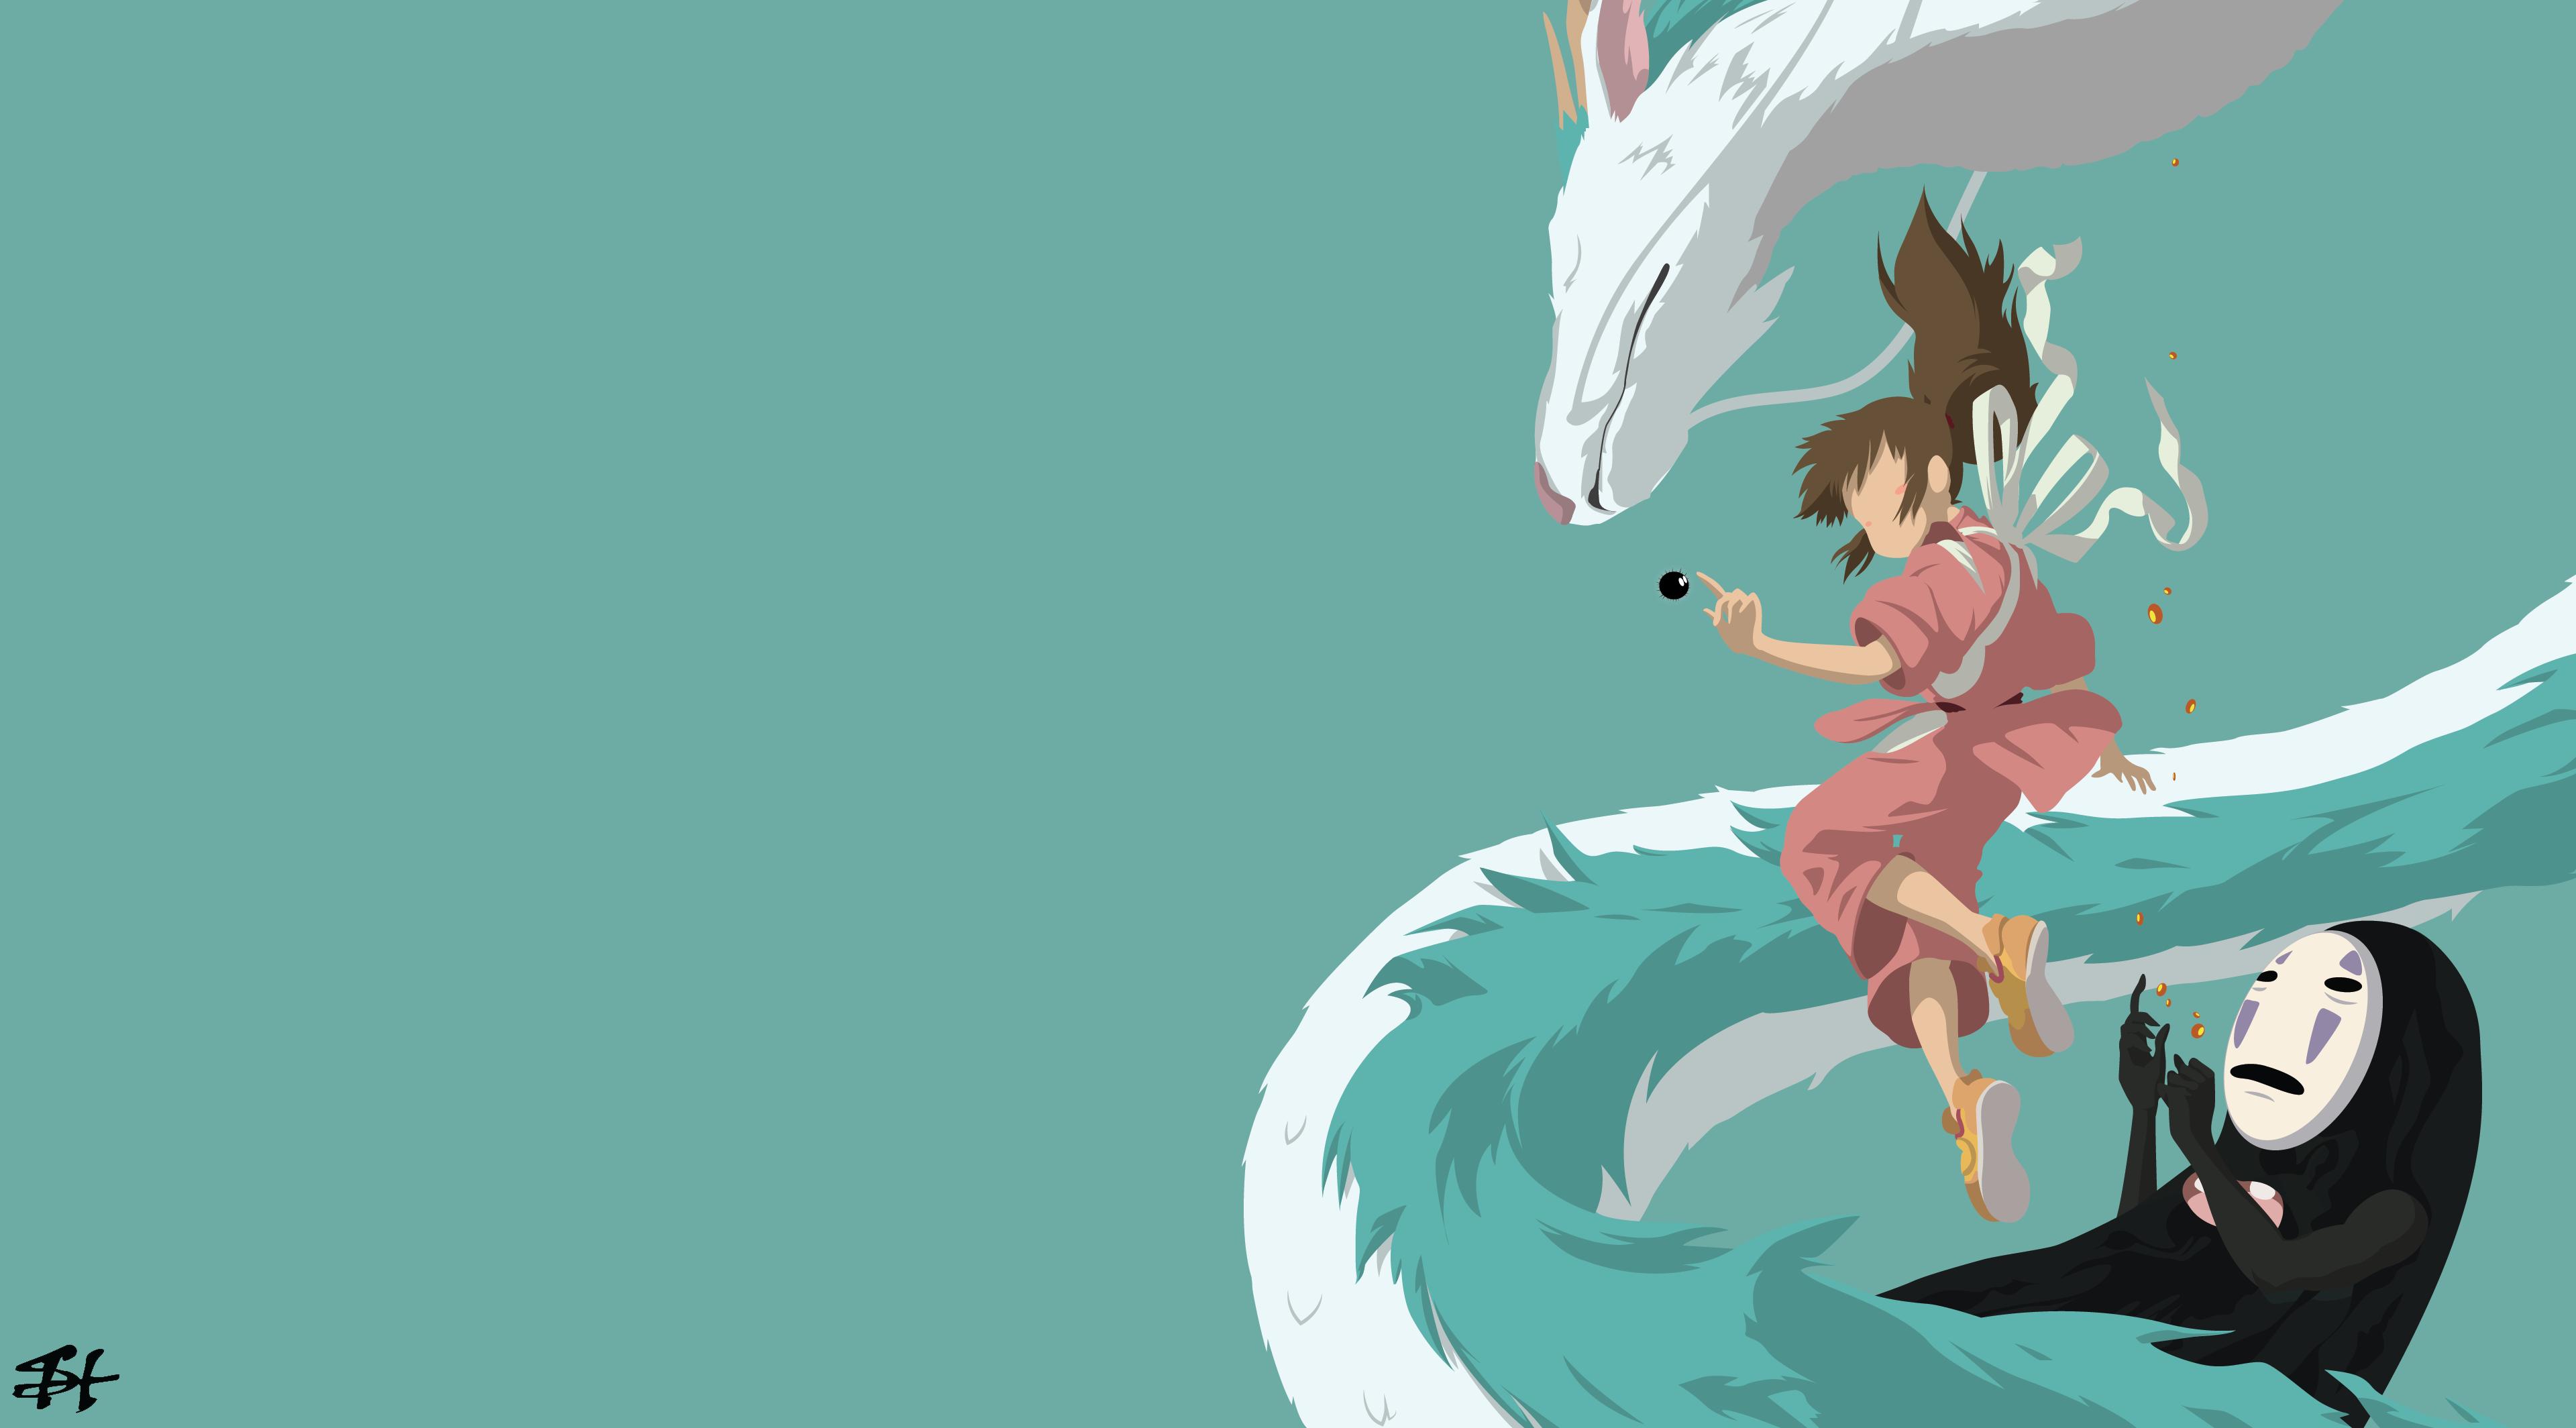 3840x2129 Wallpaper Illustration, Anime, Minimalism, Spirited Away